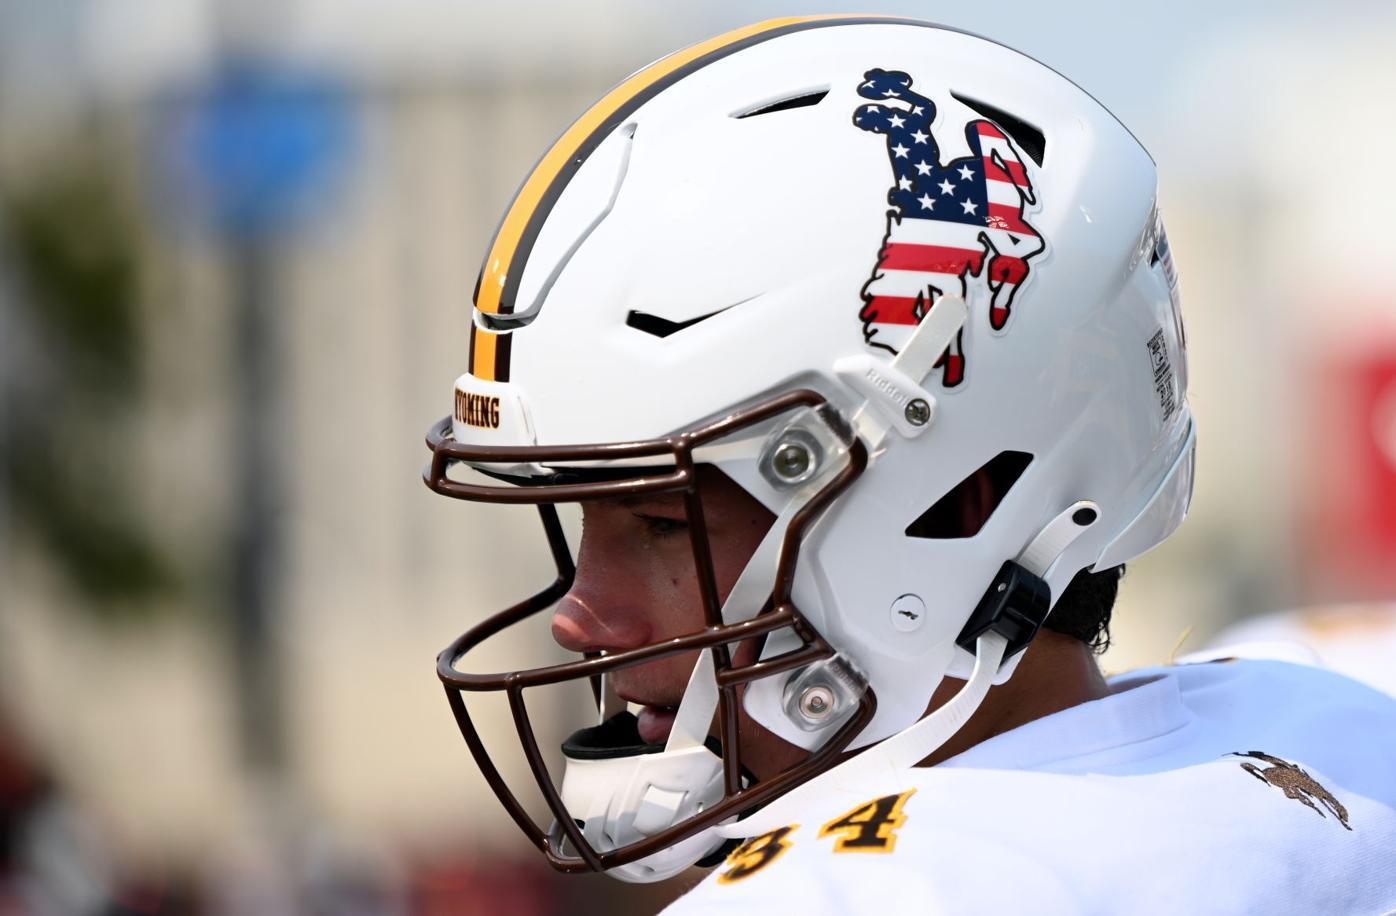 Cowboys alternate helmet 9/11